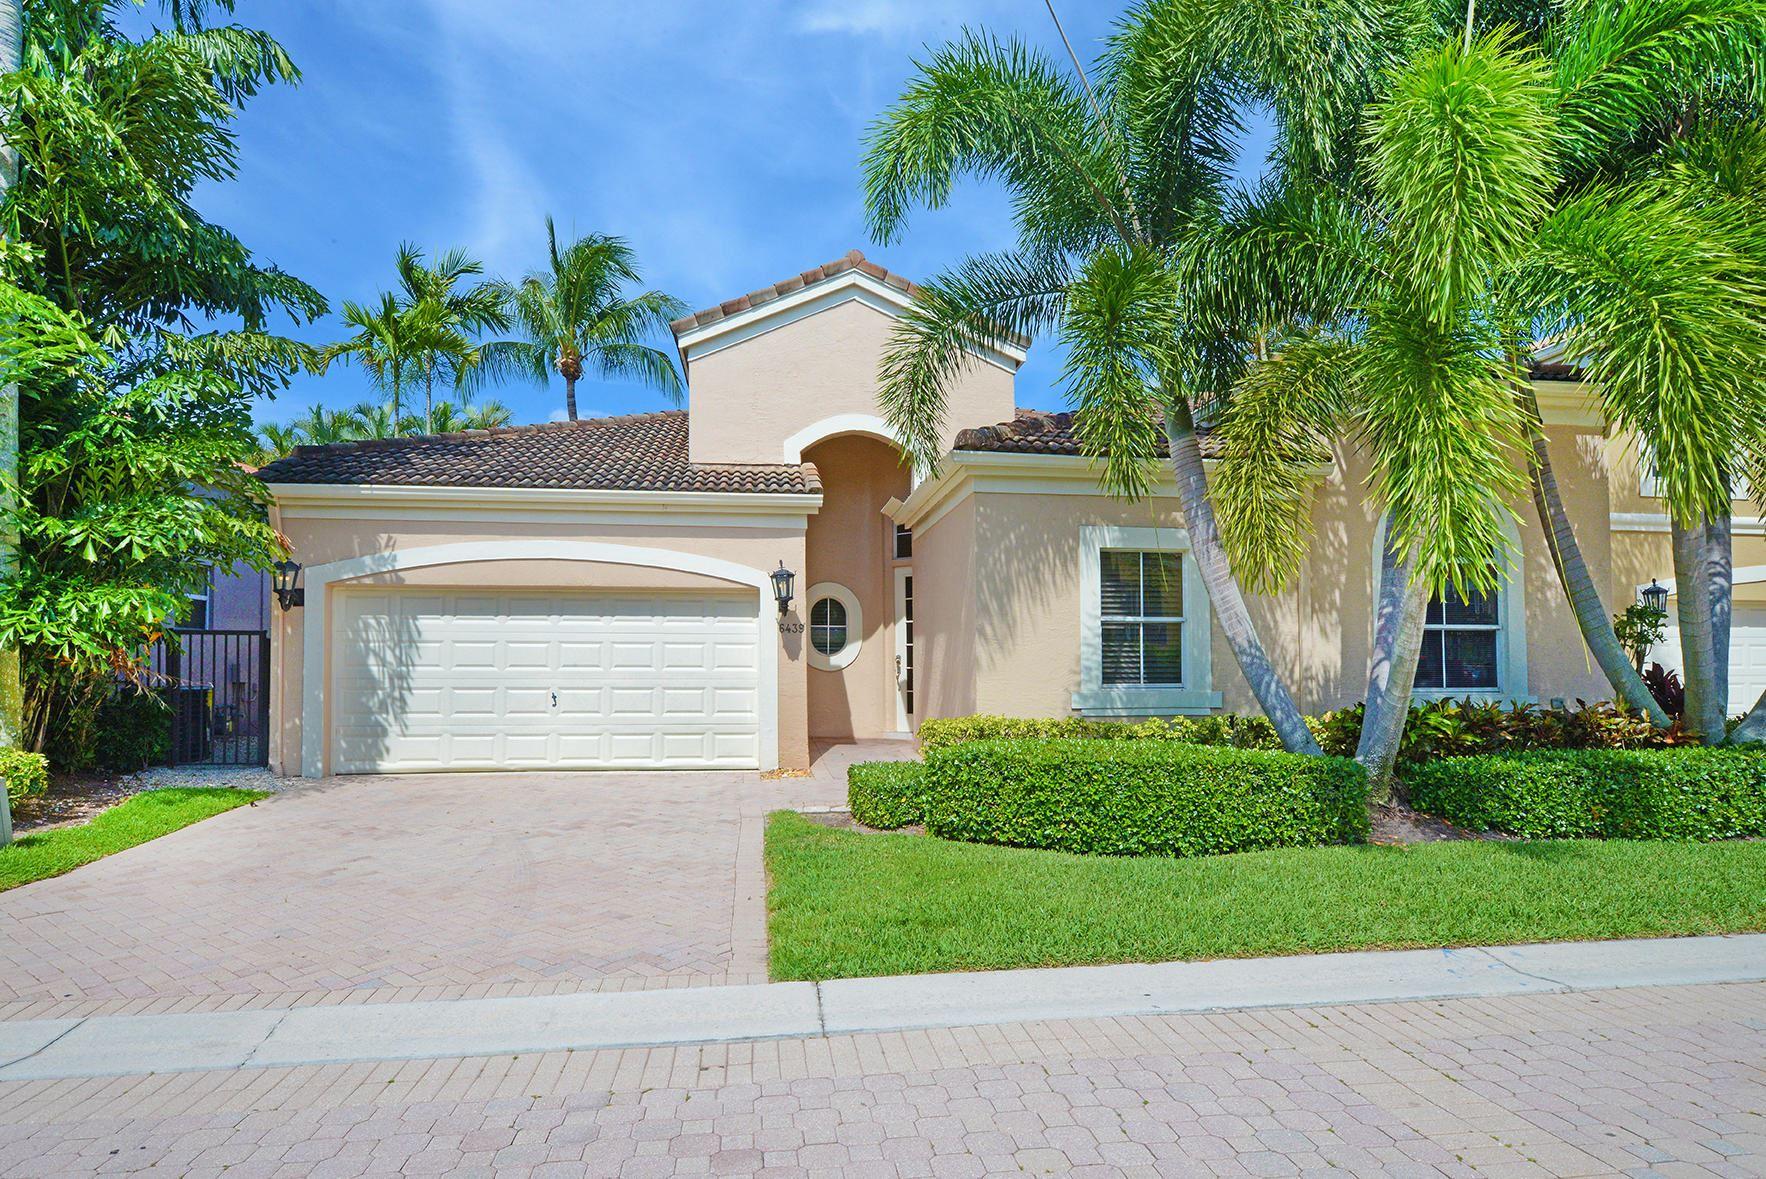 6439 NW 43rd Terrace, Boca Raton, FL 33496 - #: RX-10692580